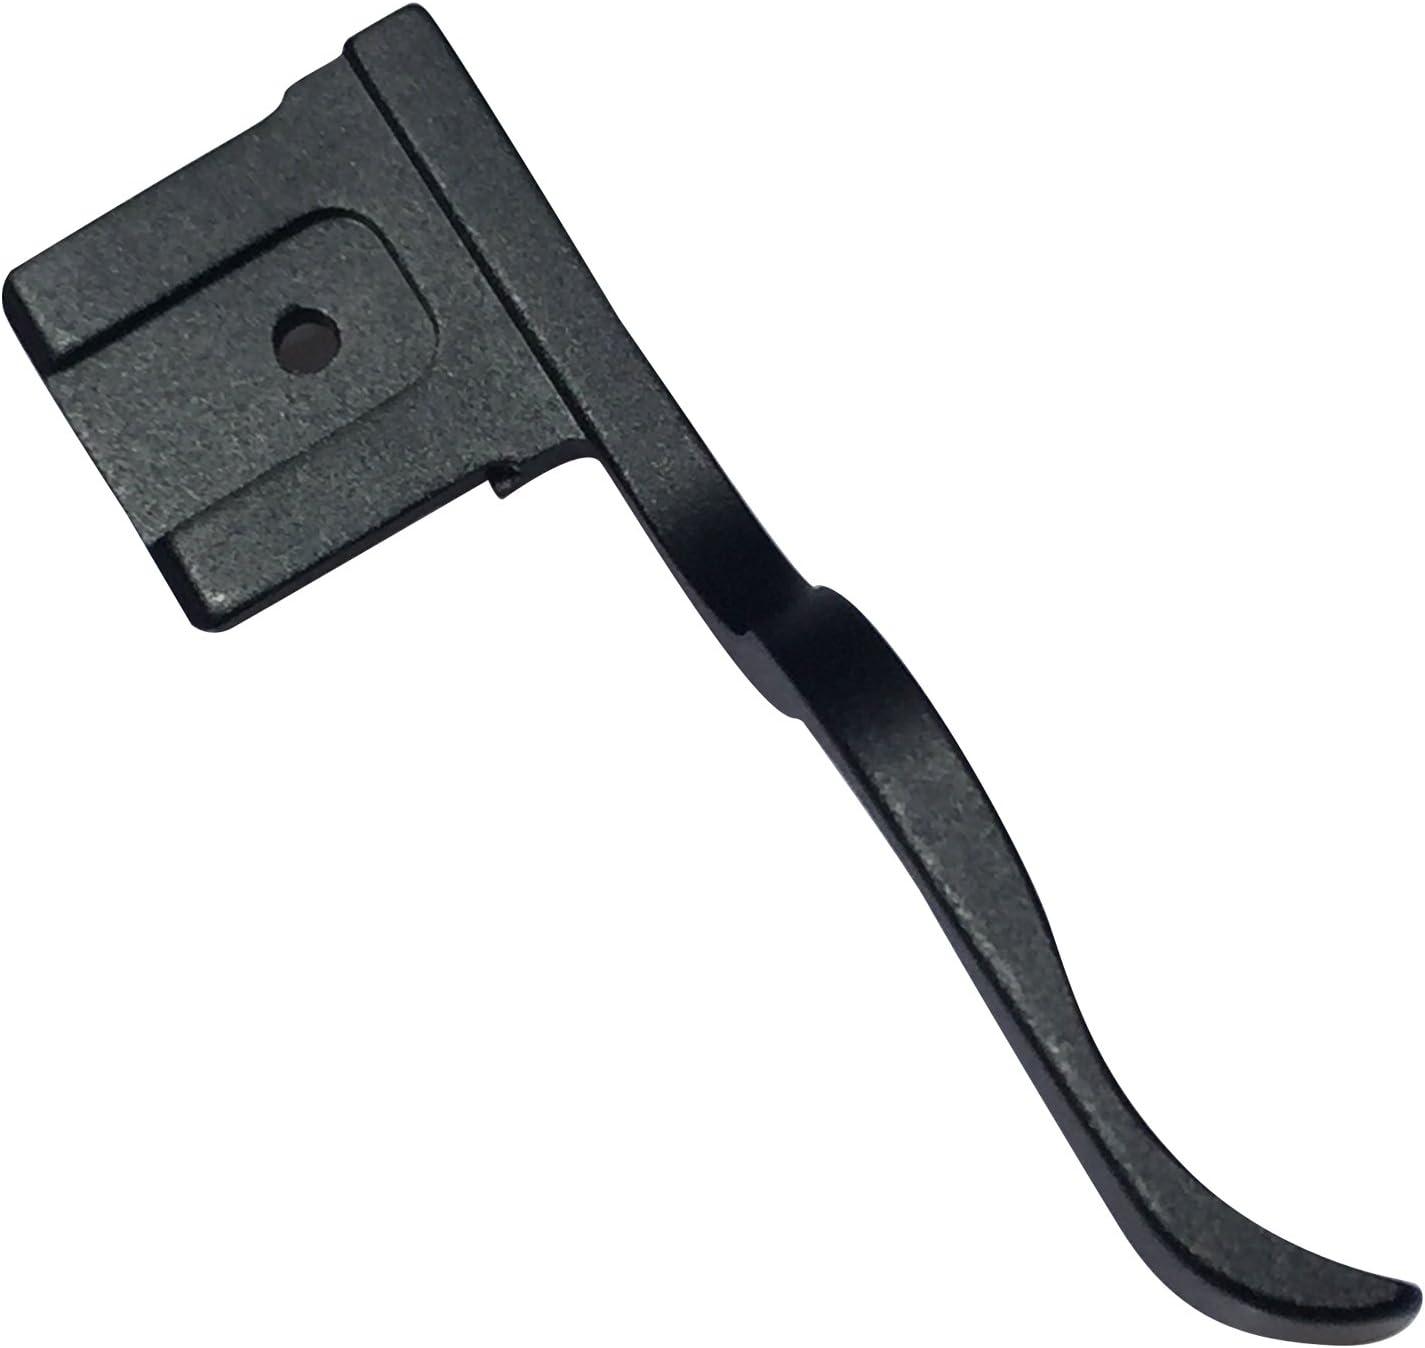 for Nikon Z6 Hand Grip Z7 Thumb-up Grip Z7 Hand Grip Designs for Nikon Z6 Z7 Hand Grip